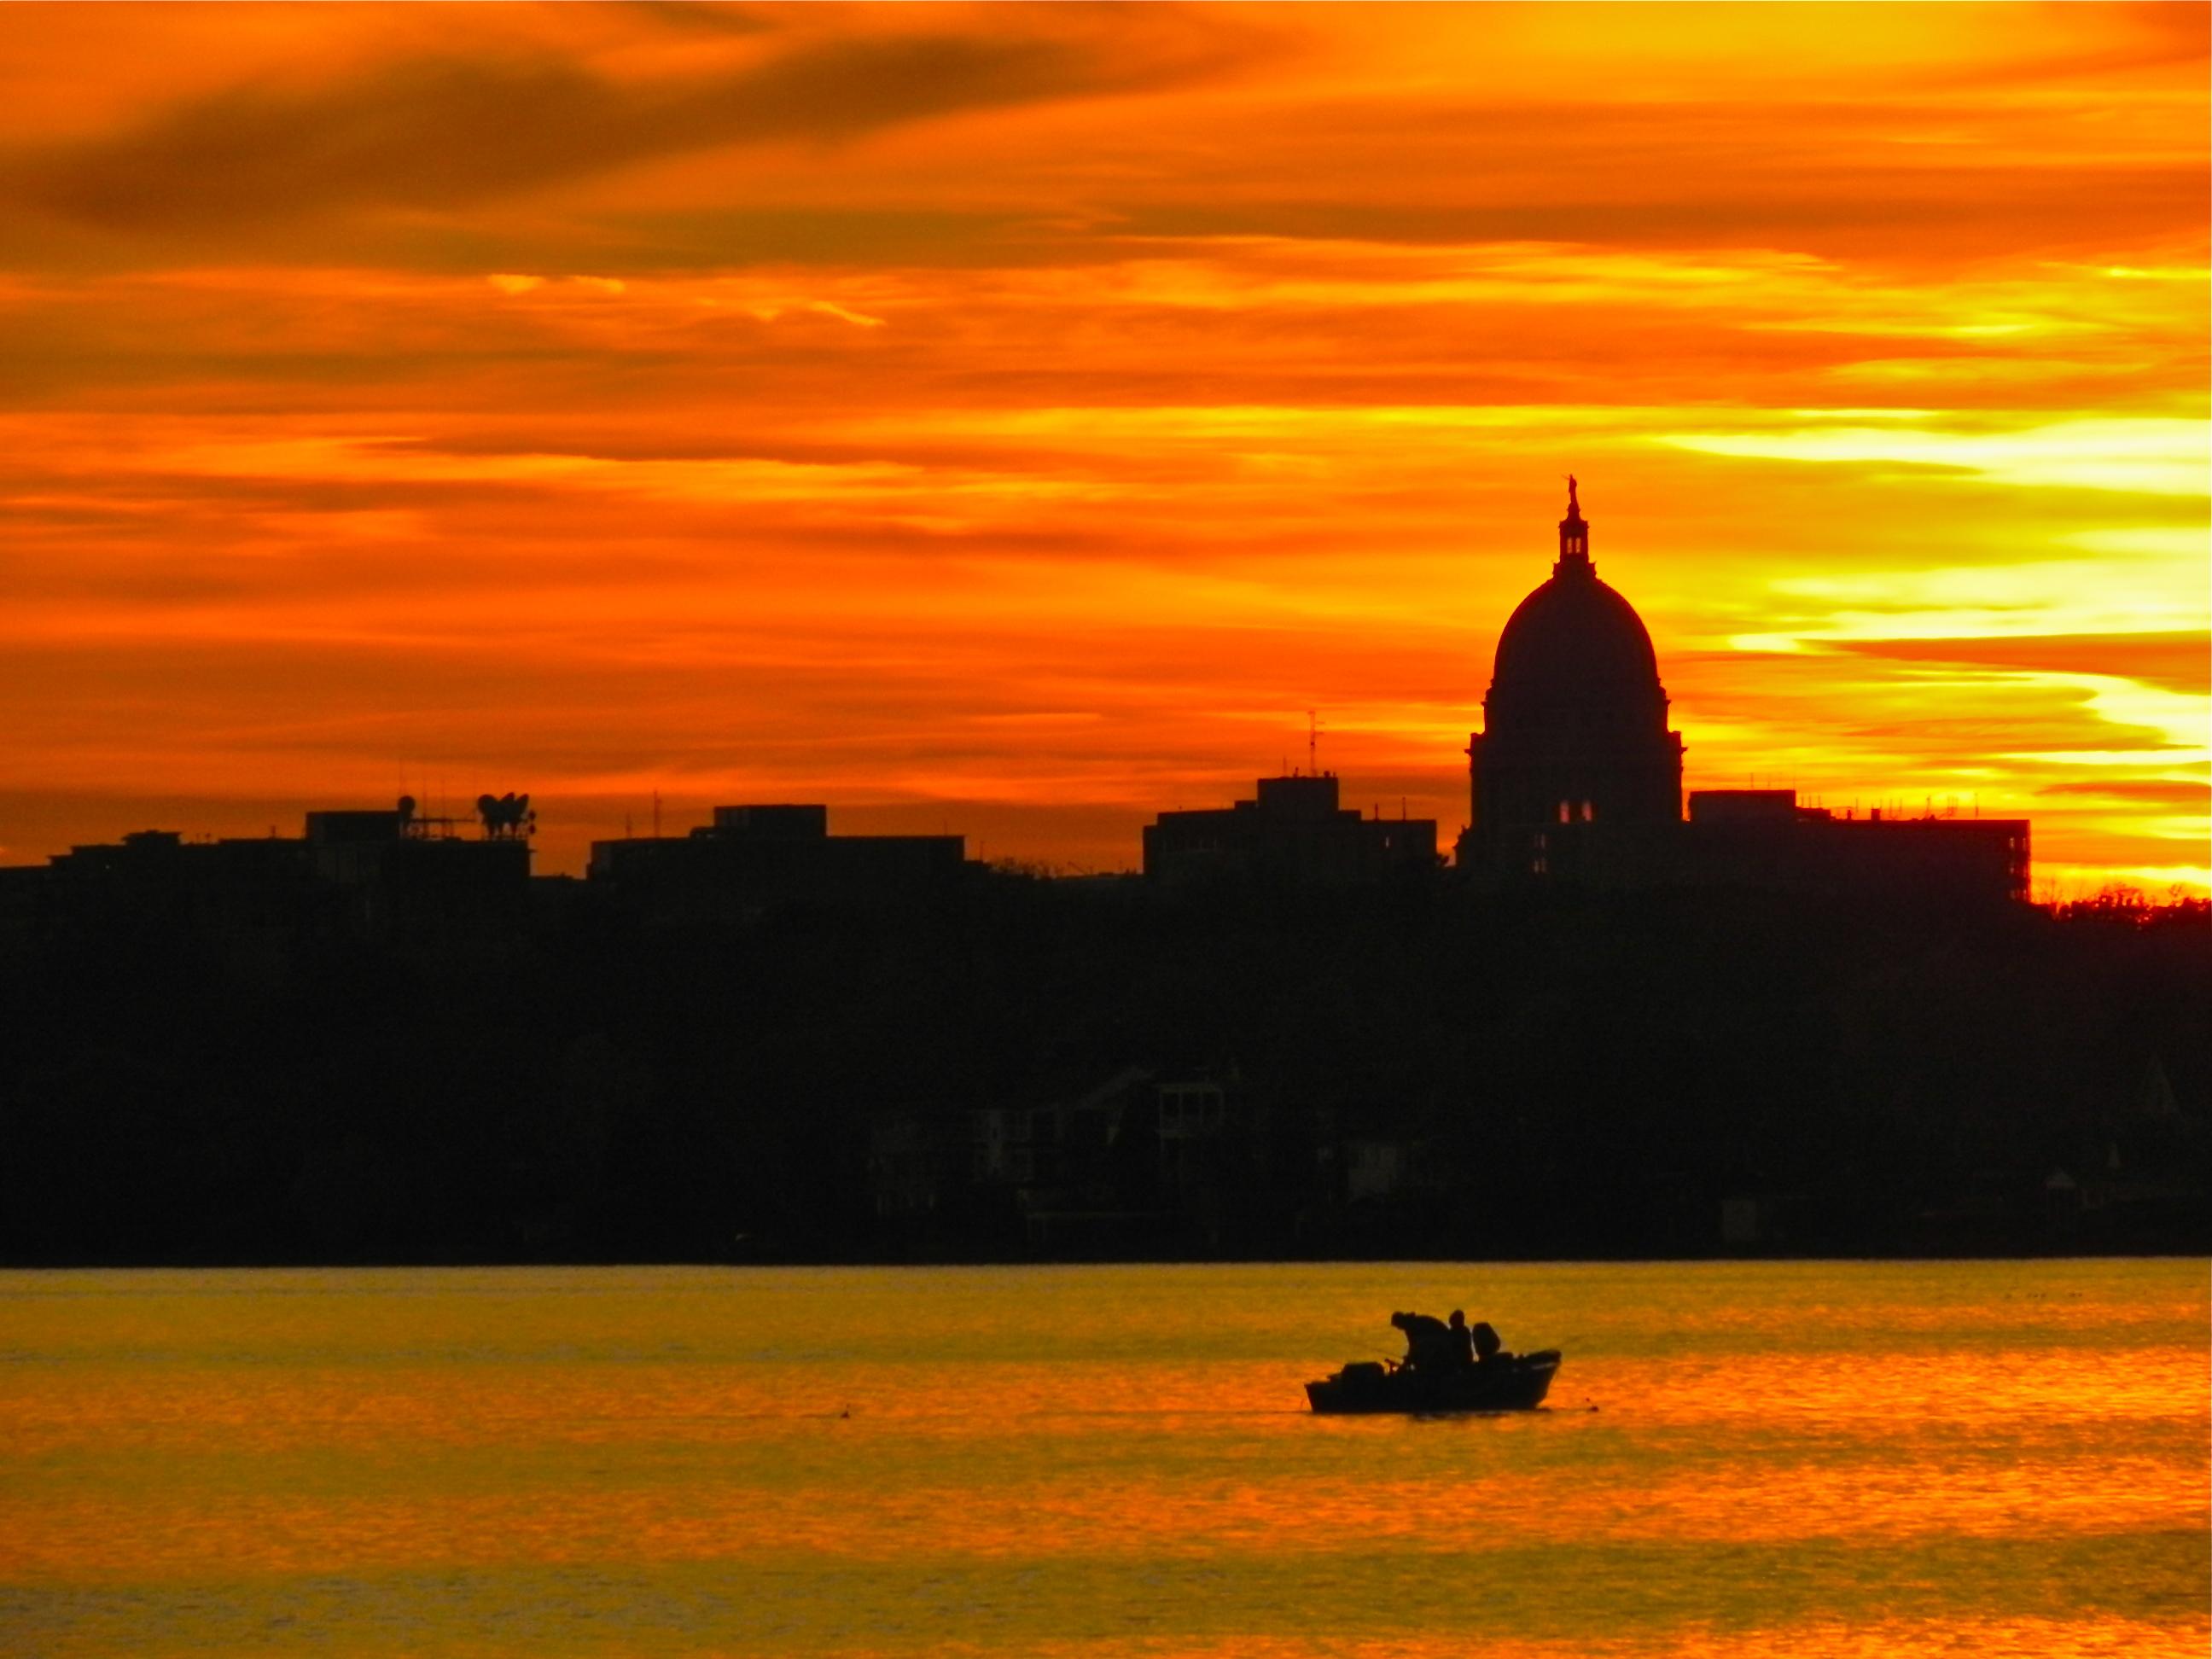 https://upload.wikimedia.org/wikipedia/commons/5/5e/Wisconsin_State_Capitol_at_Sunset.JPG